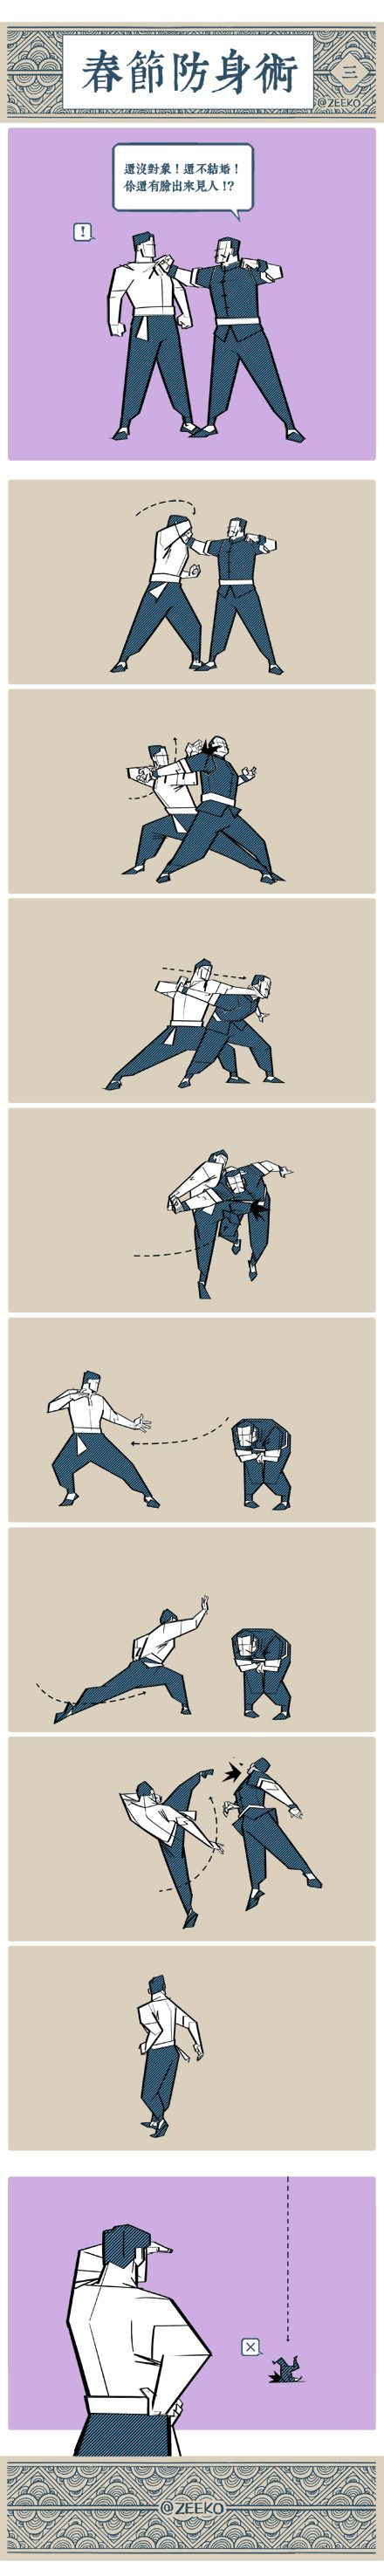 Dominio de la defensa personal